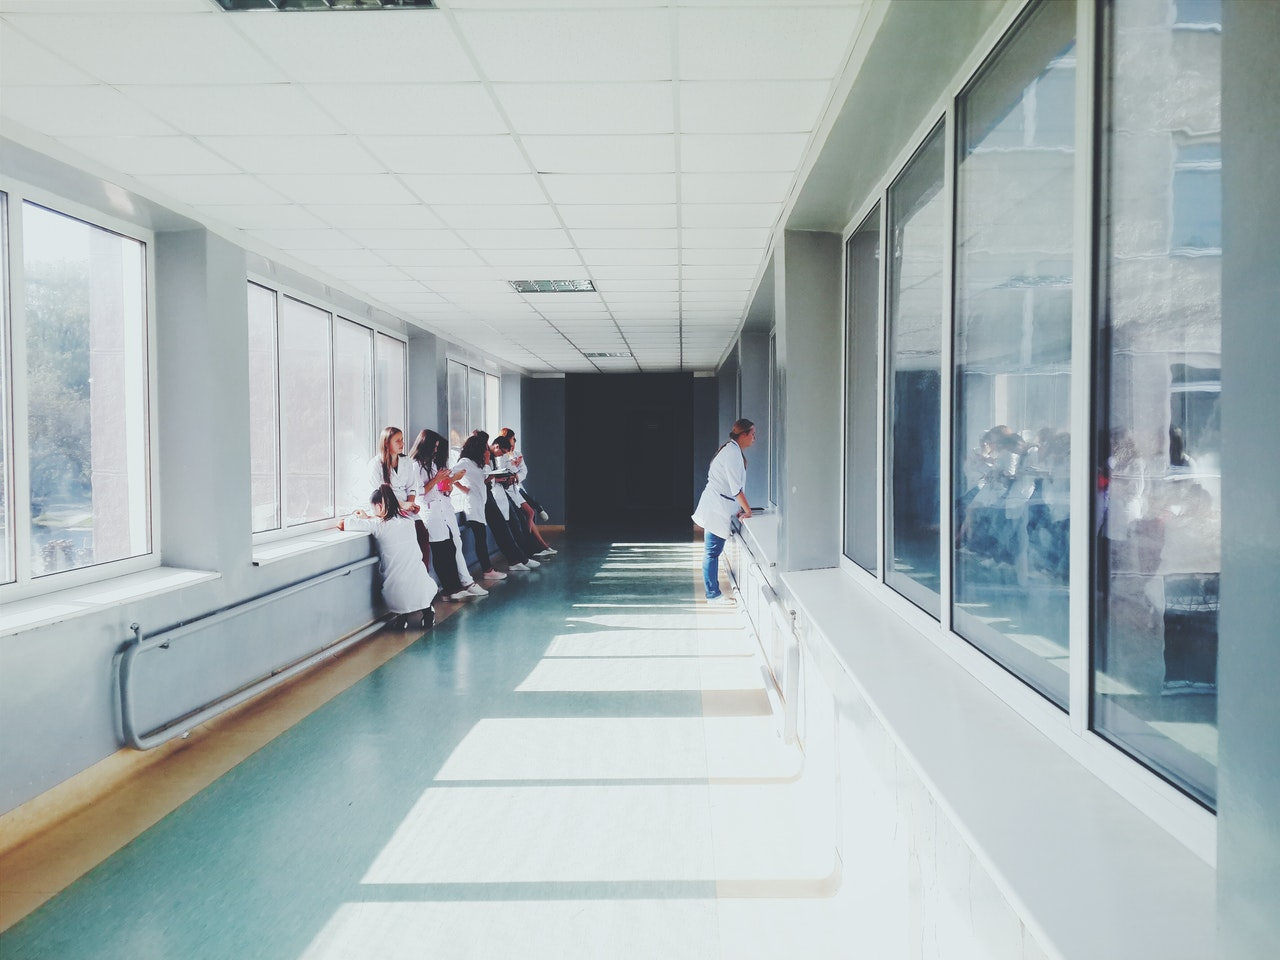 hallway of a hospital